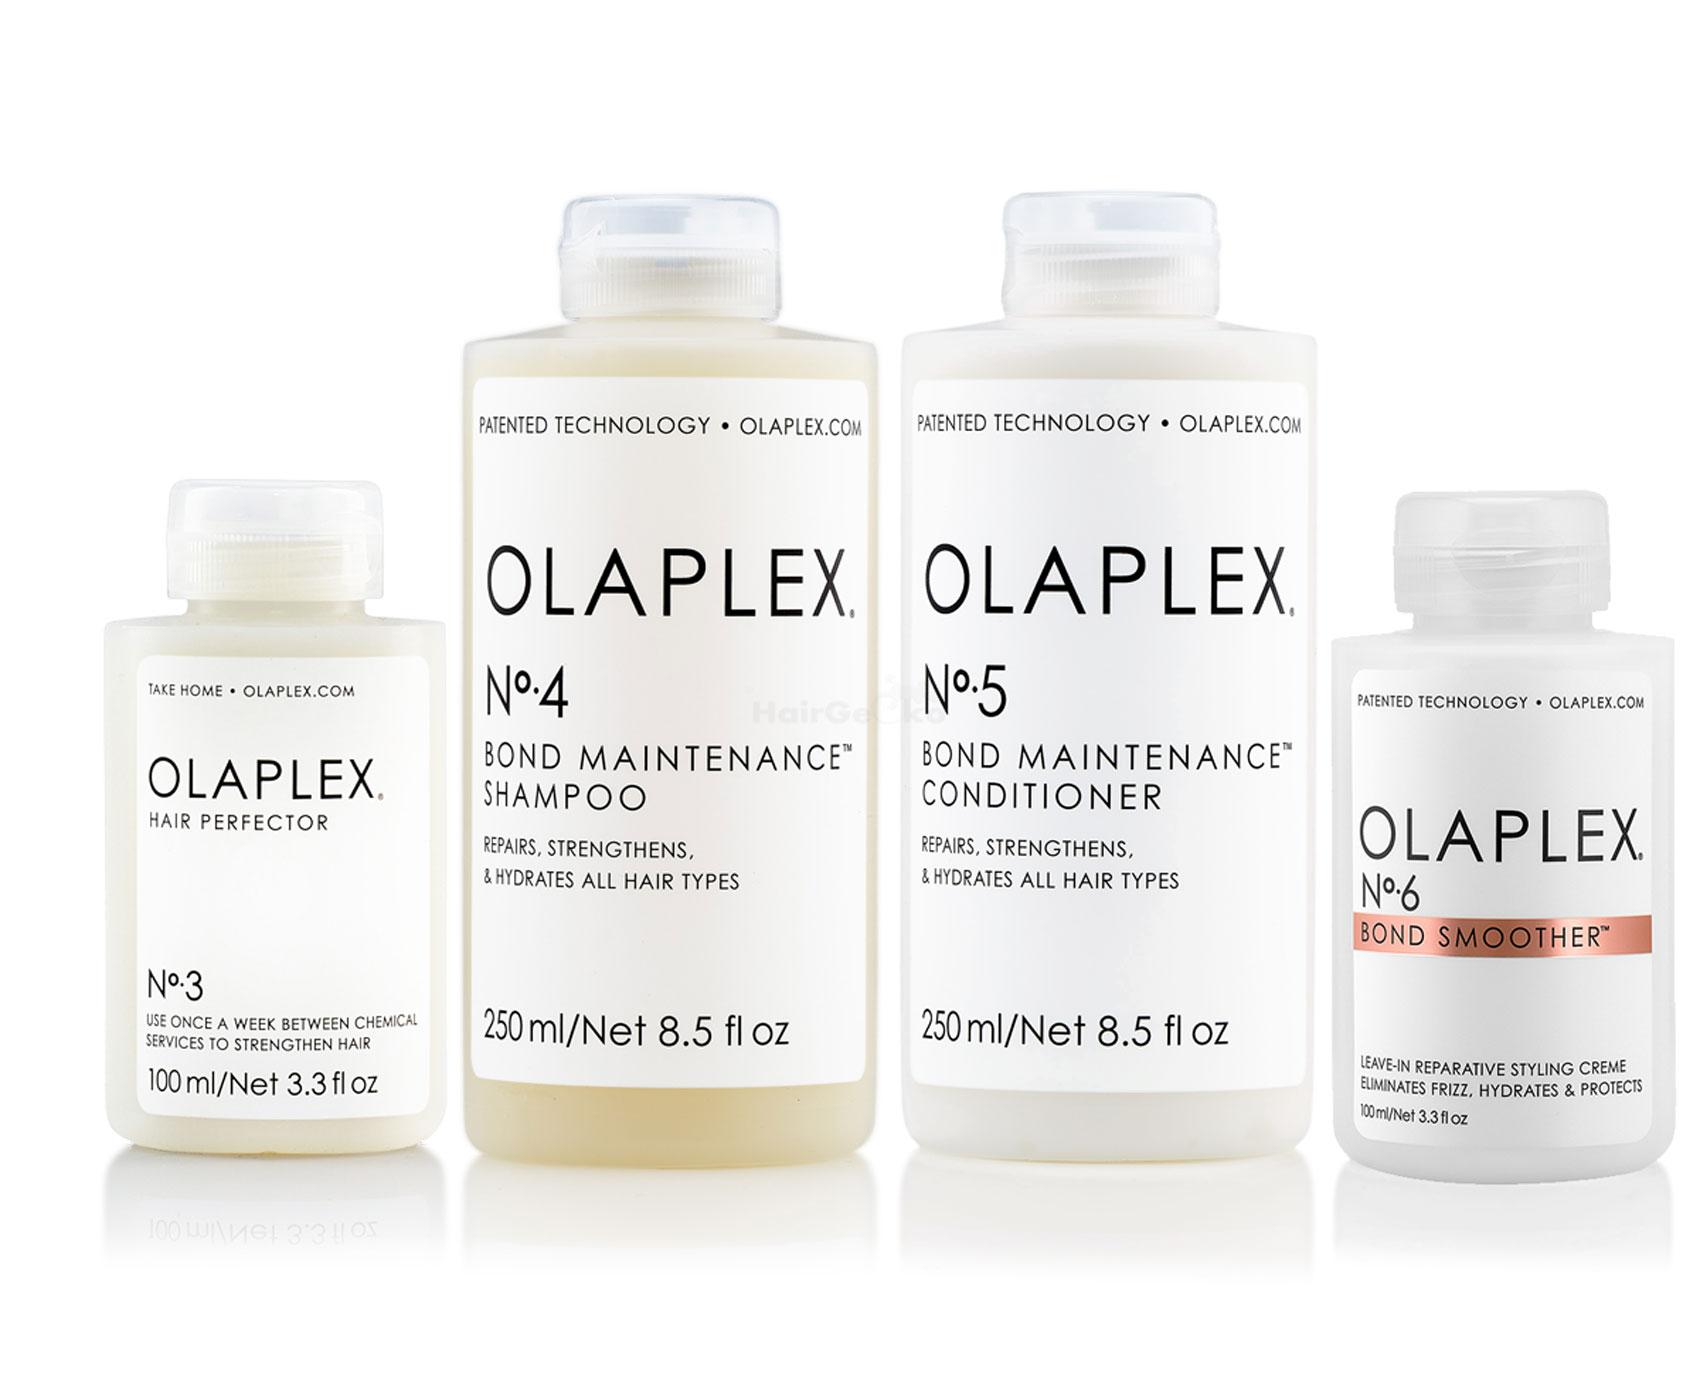 Olaplex Set - Olaplex Bond Maintenance Shampoo No 4 (250ml) + Olaplex Bond Maintenance Conditioner No 5 (250ml) + Olaplex Hair Perfector No 3 (100ml) + Olaplex Bond Smoother No 6 (100ml)